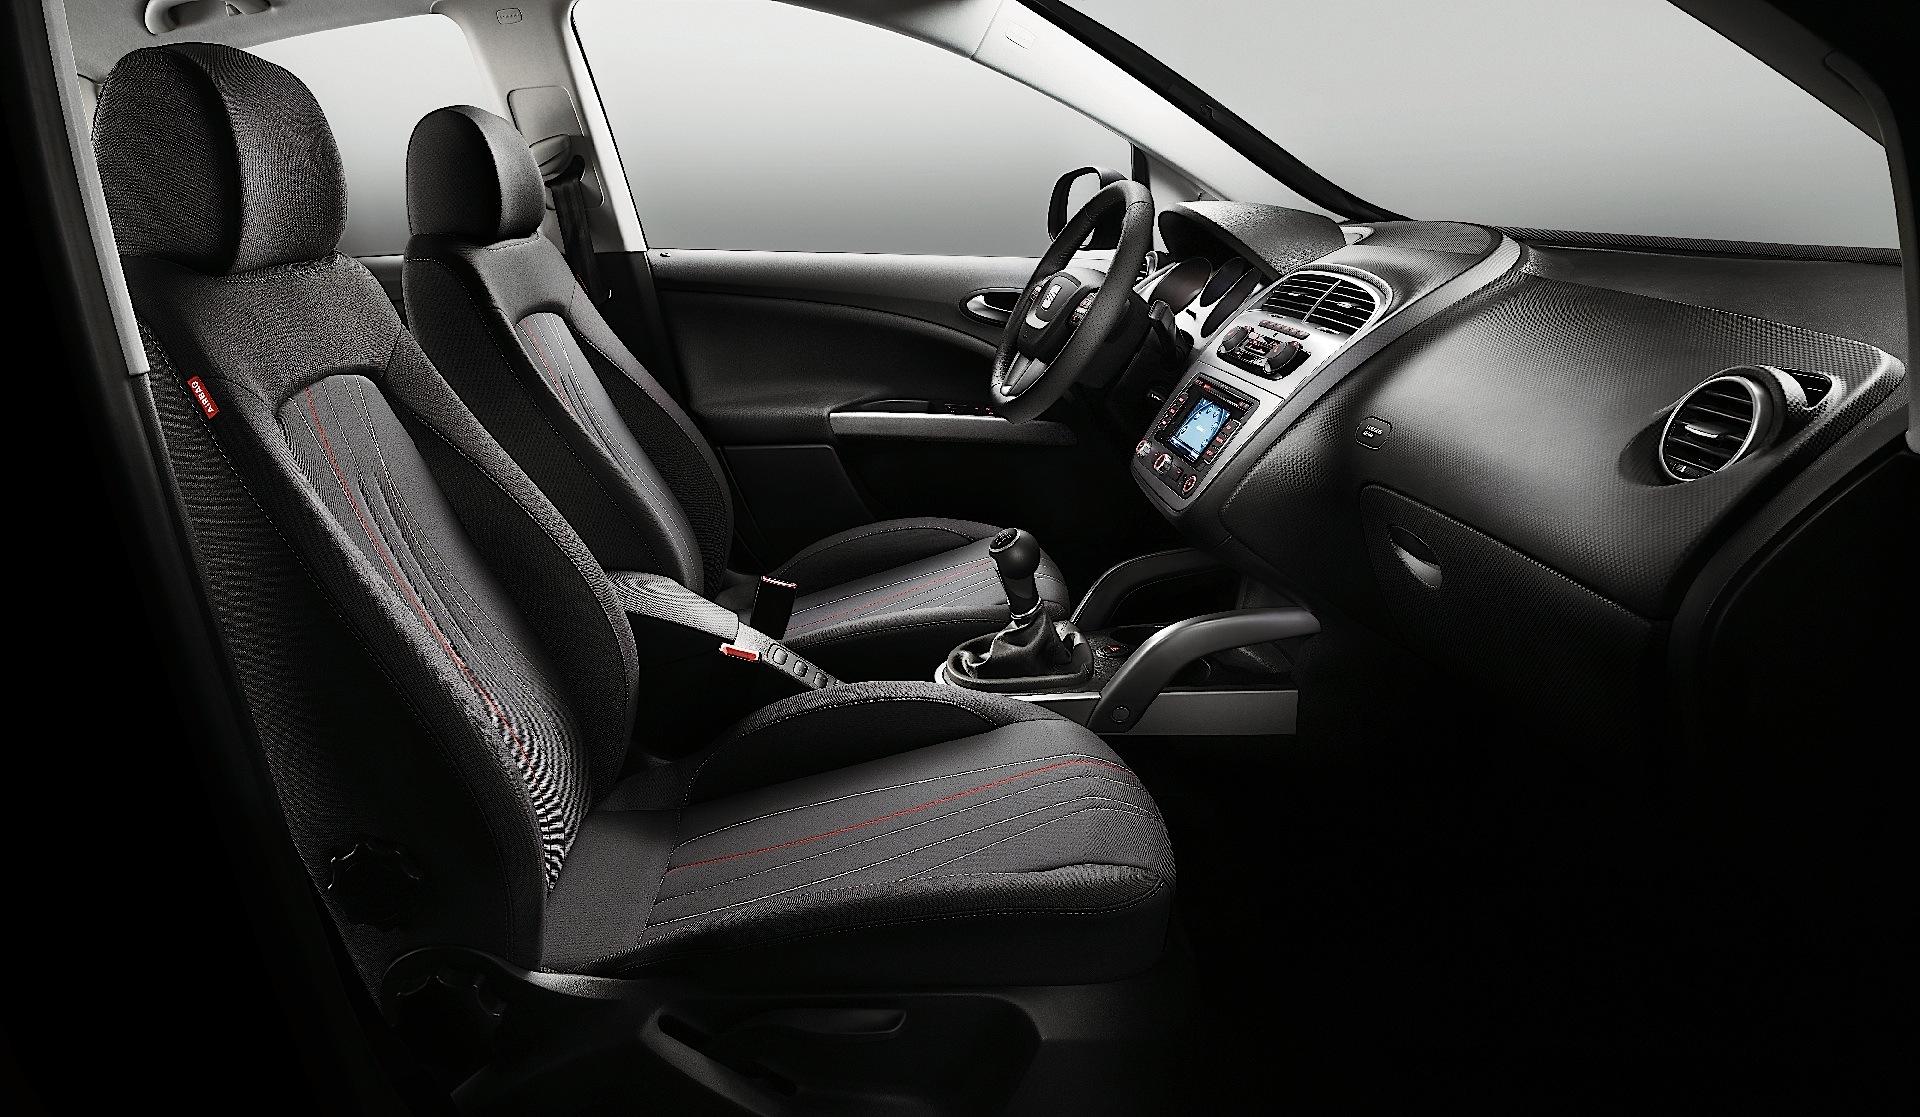 SEAT Altea specs & photos - 2009, 2010, 2011, 2012, 2013, 2014, 2015 ...